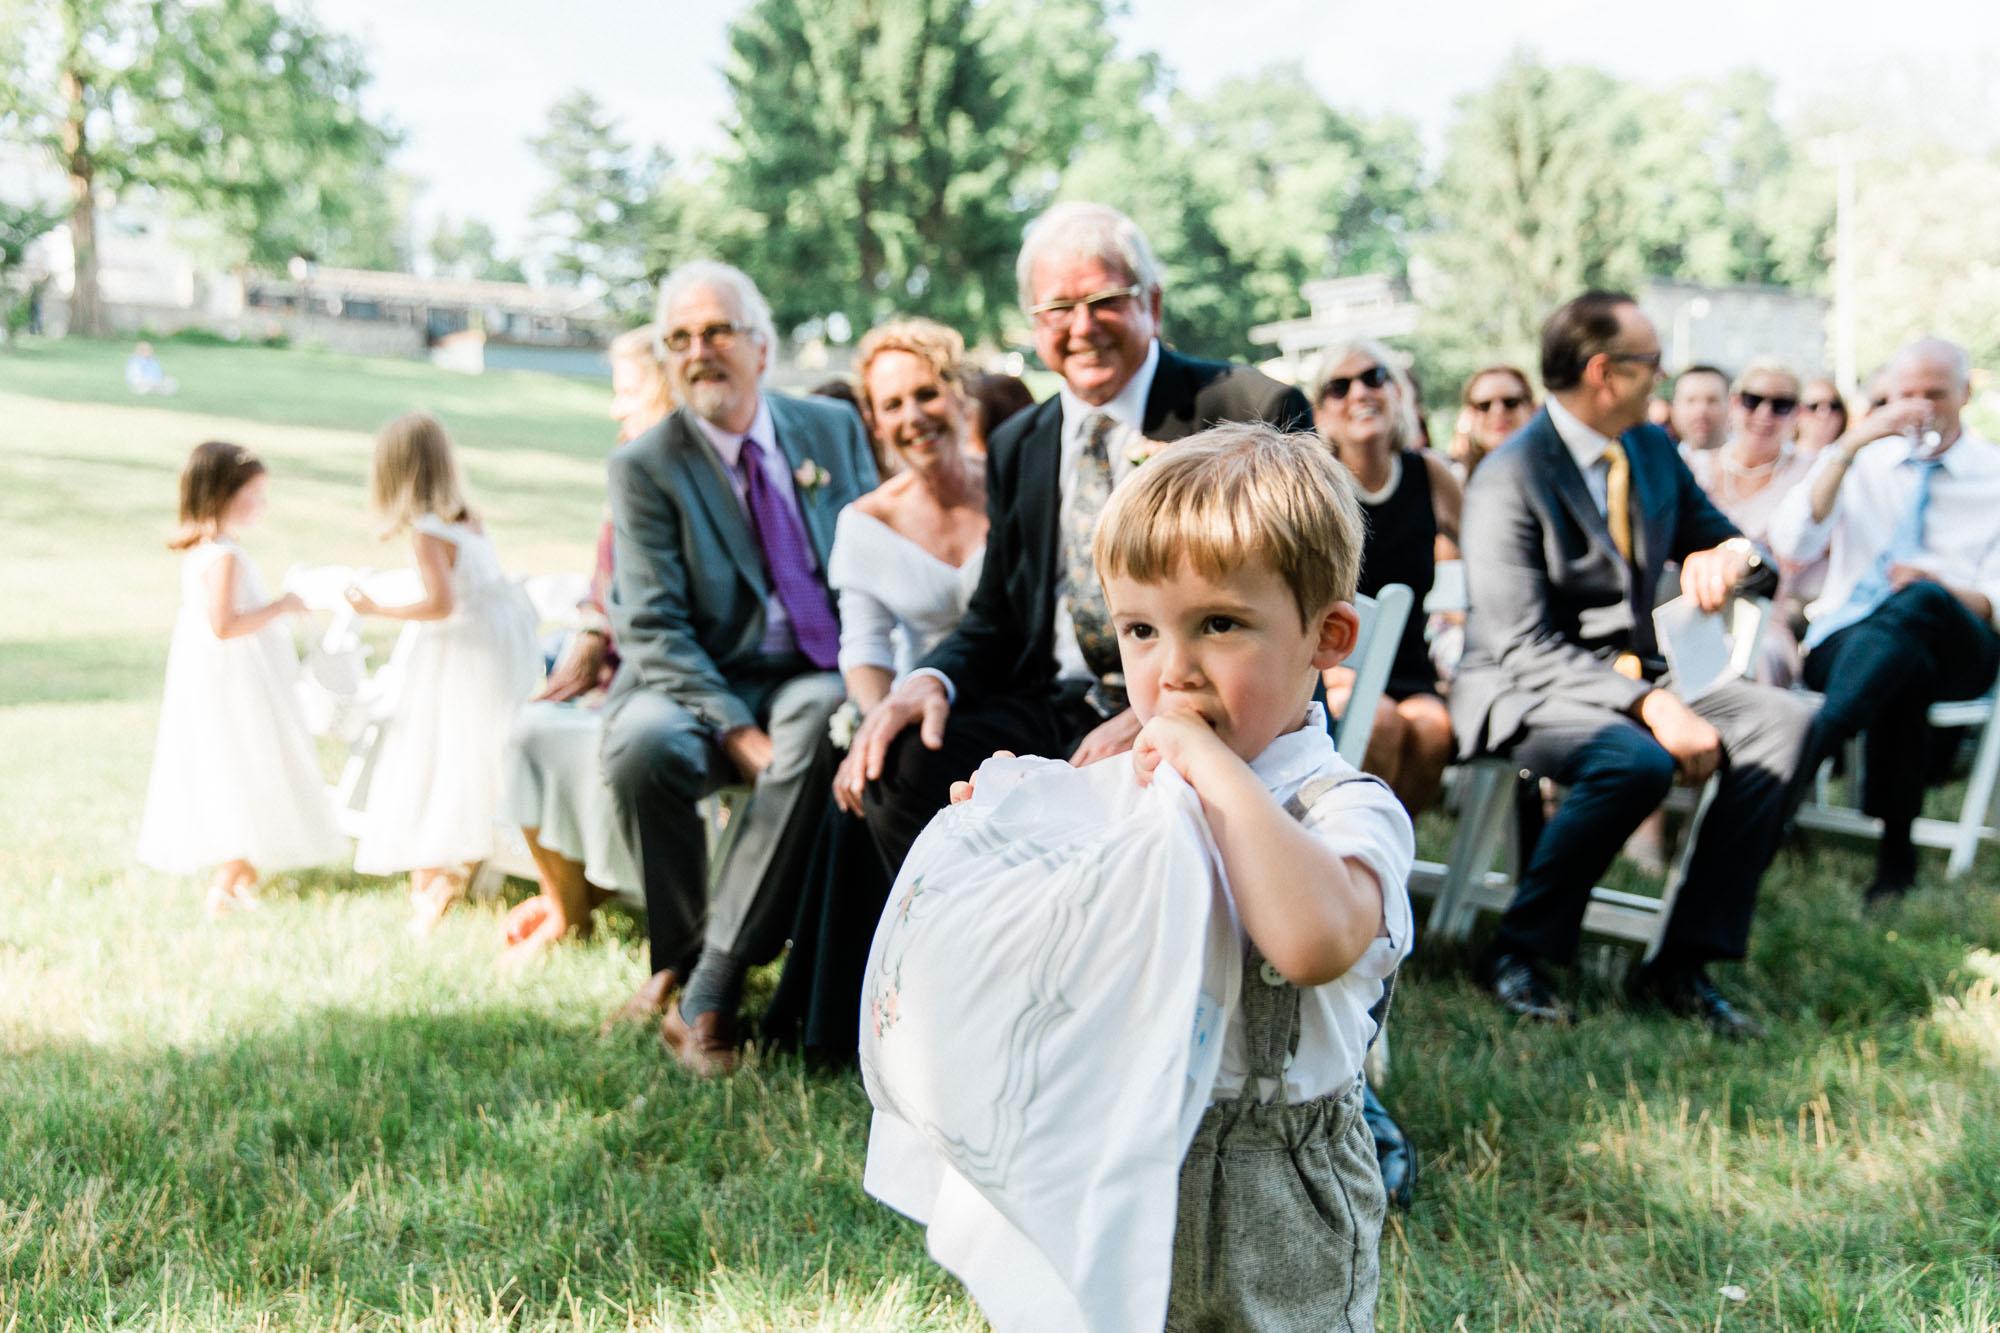 Allenberry-resort-historic-pennsylvania-wedding-19892.jpg